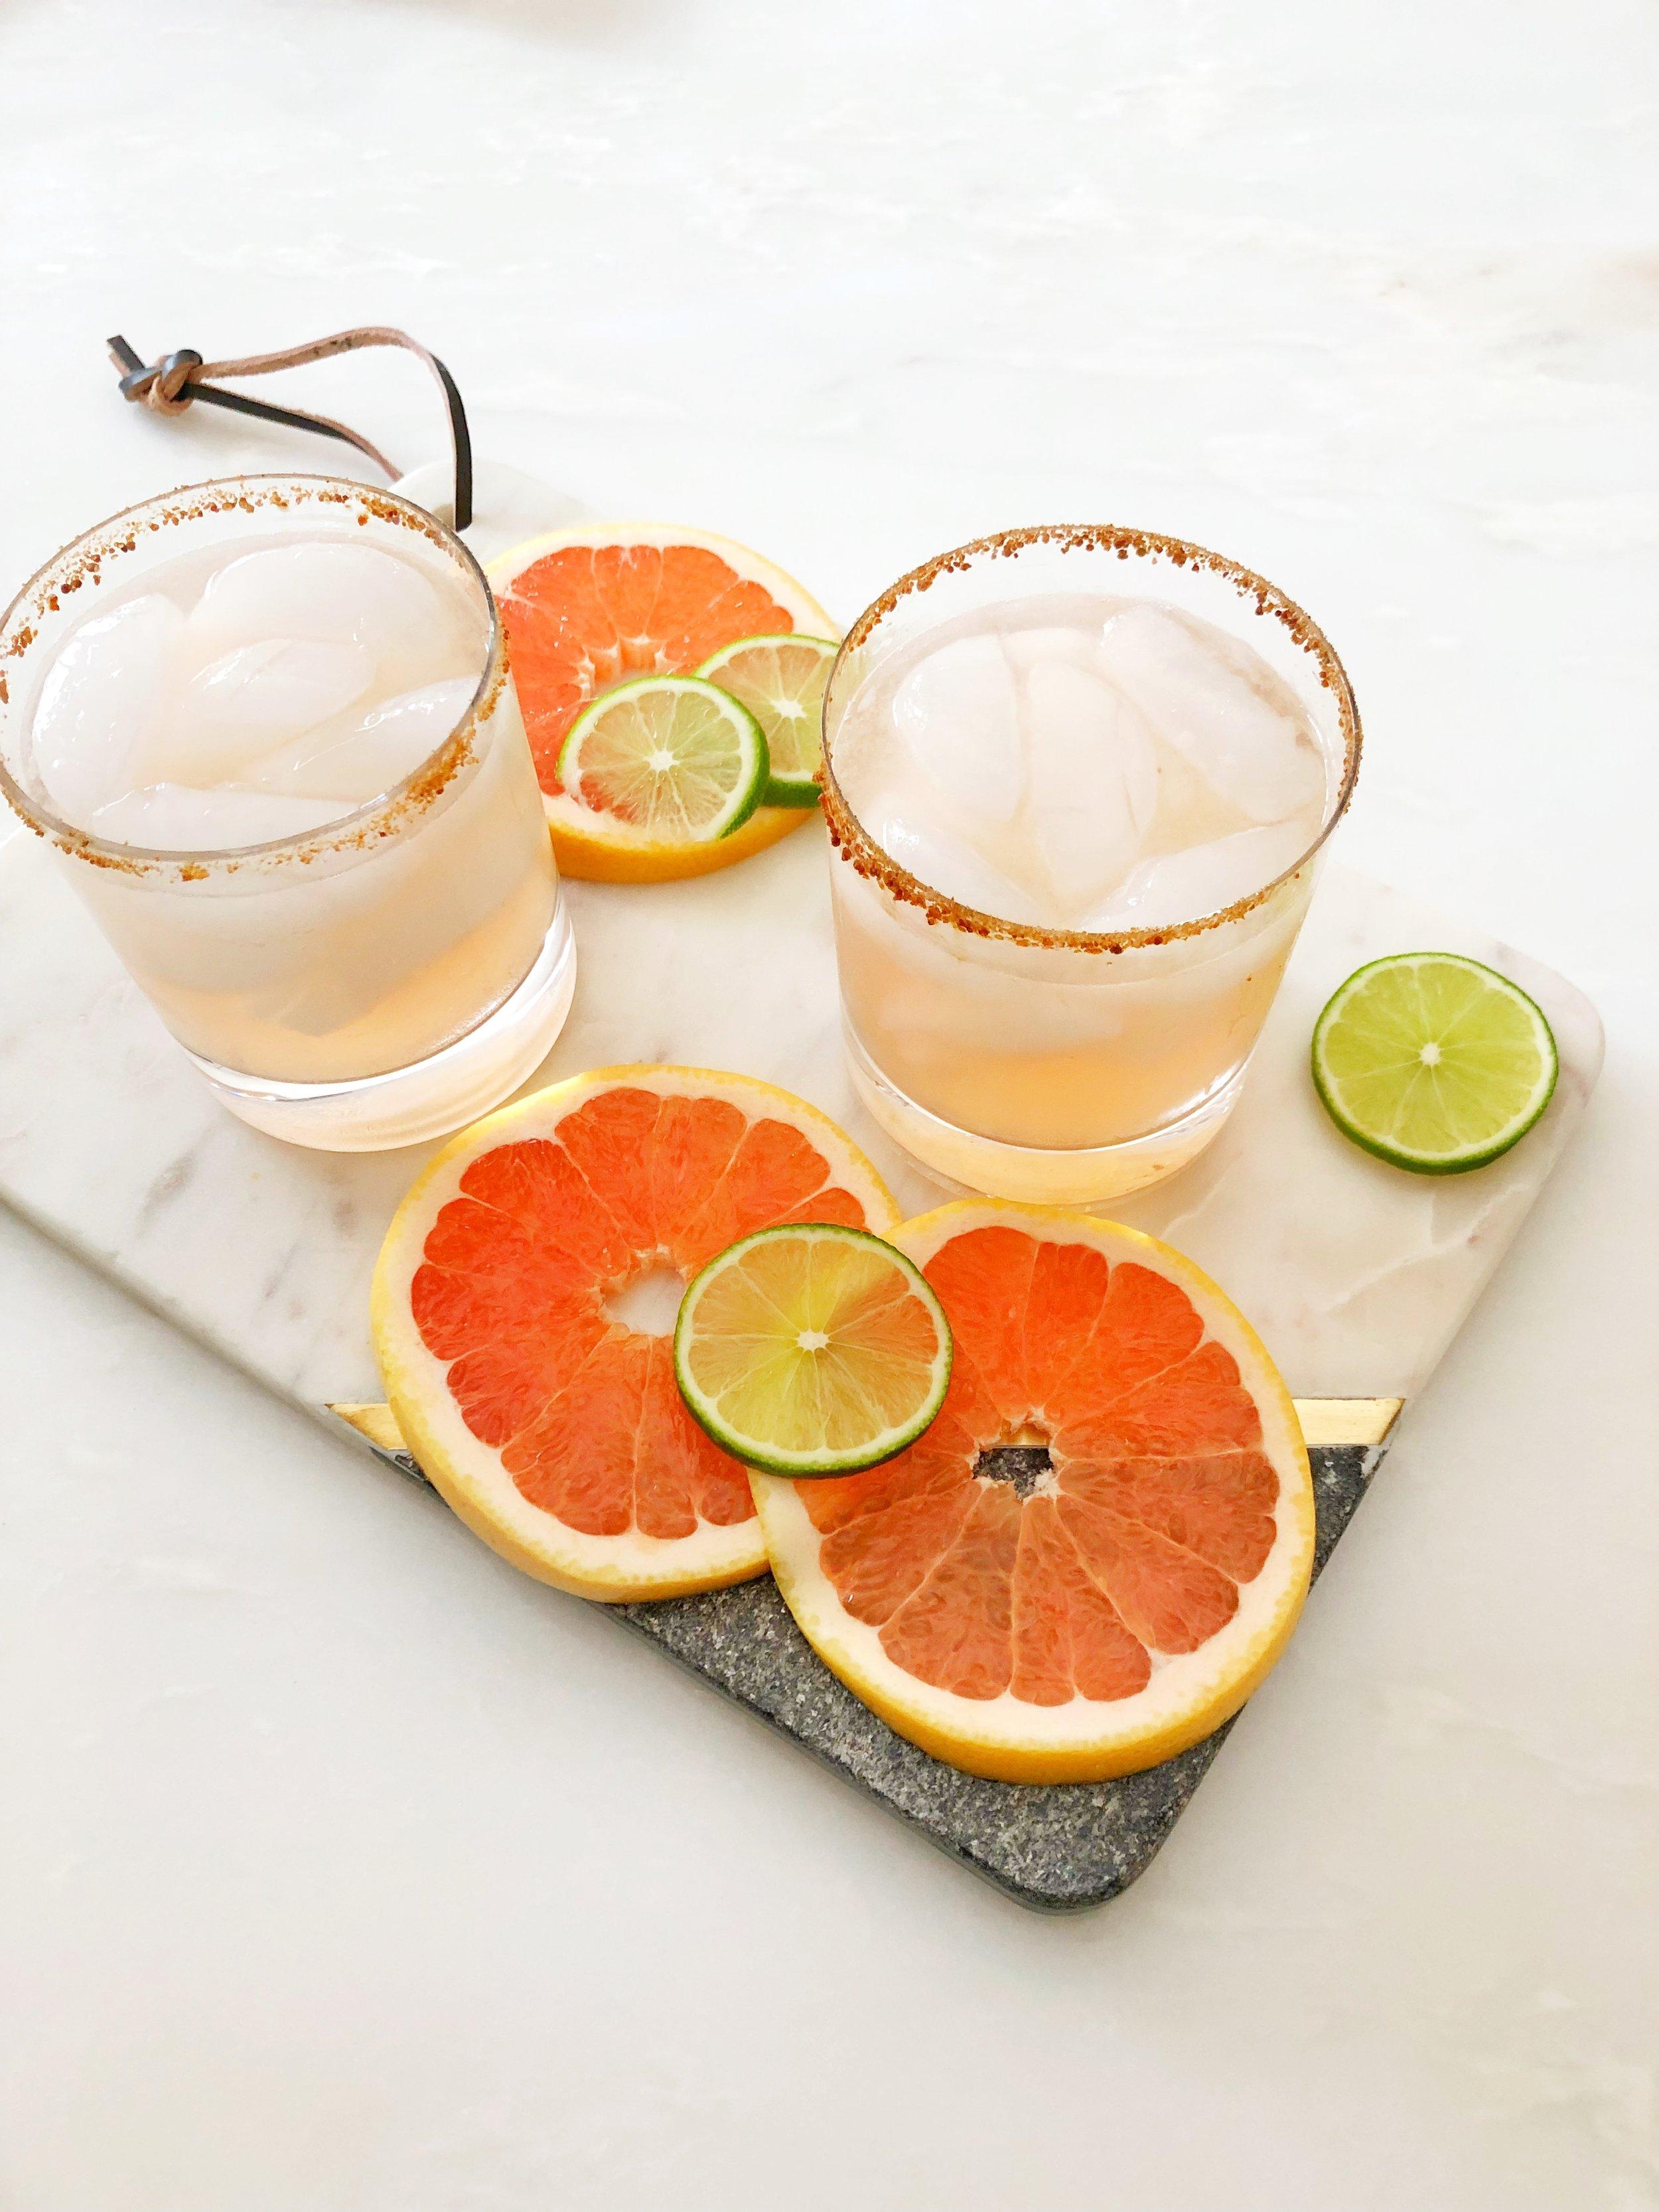 IMG_1325.jpg-cocktails-margaritas-spindrift-no-sugar-added-tequila